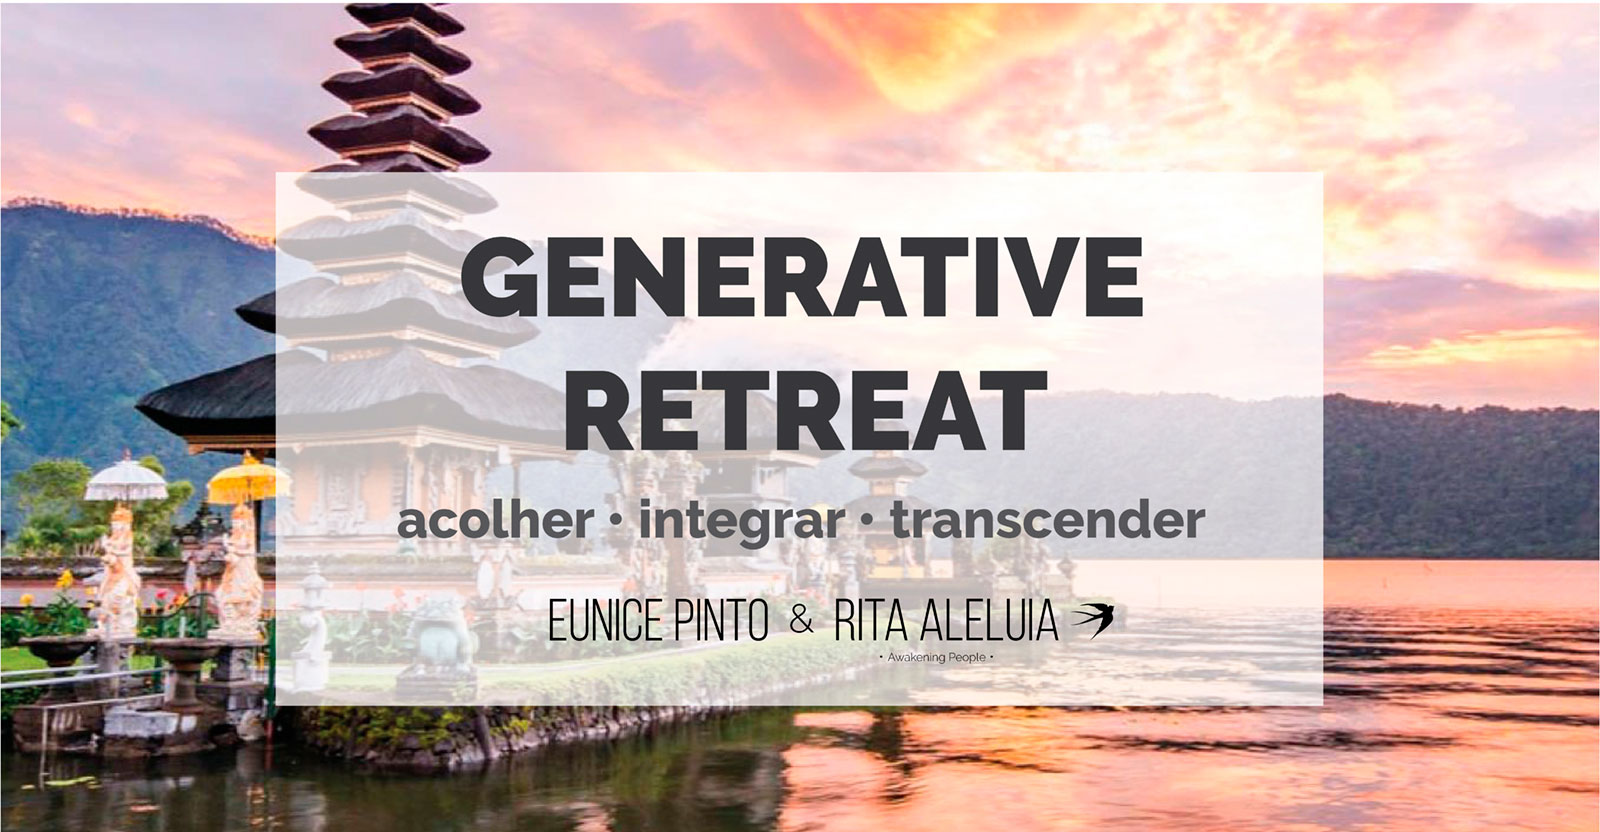 Cartaz Generative Retreat em Bali, Indonesia